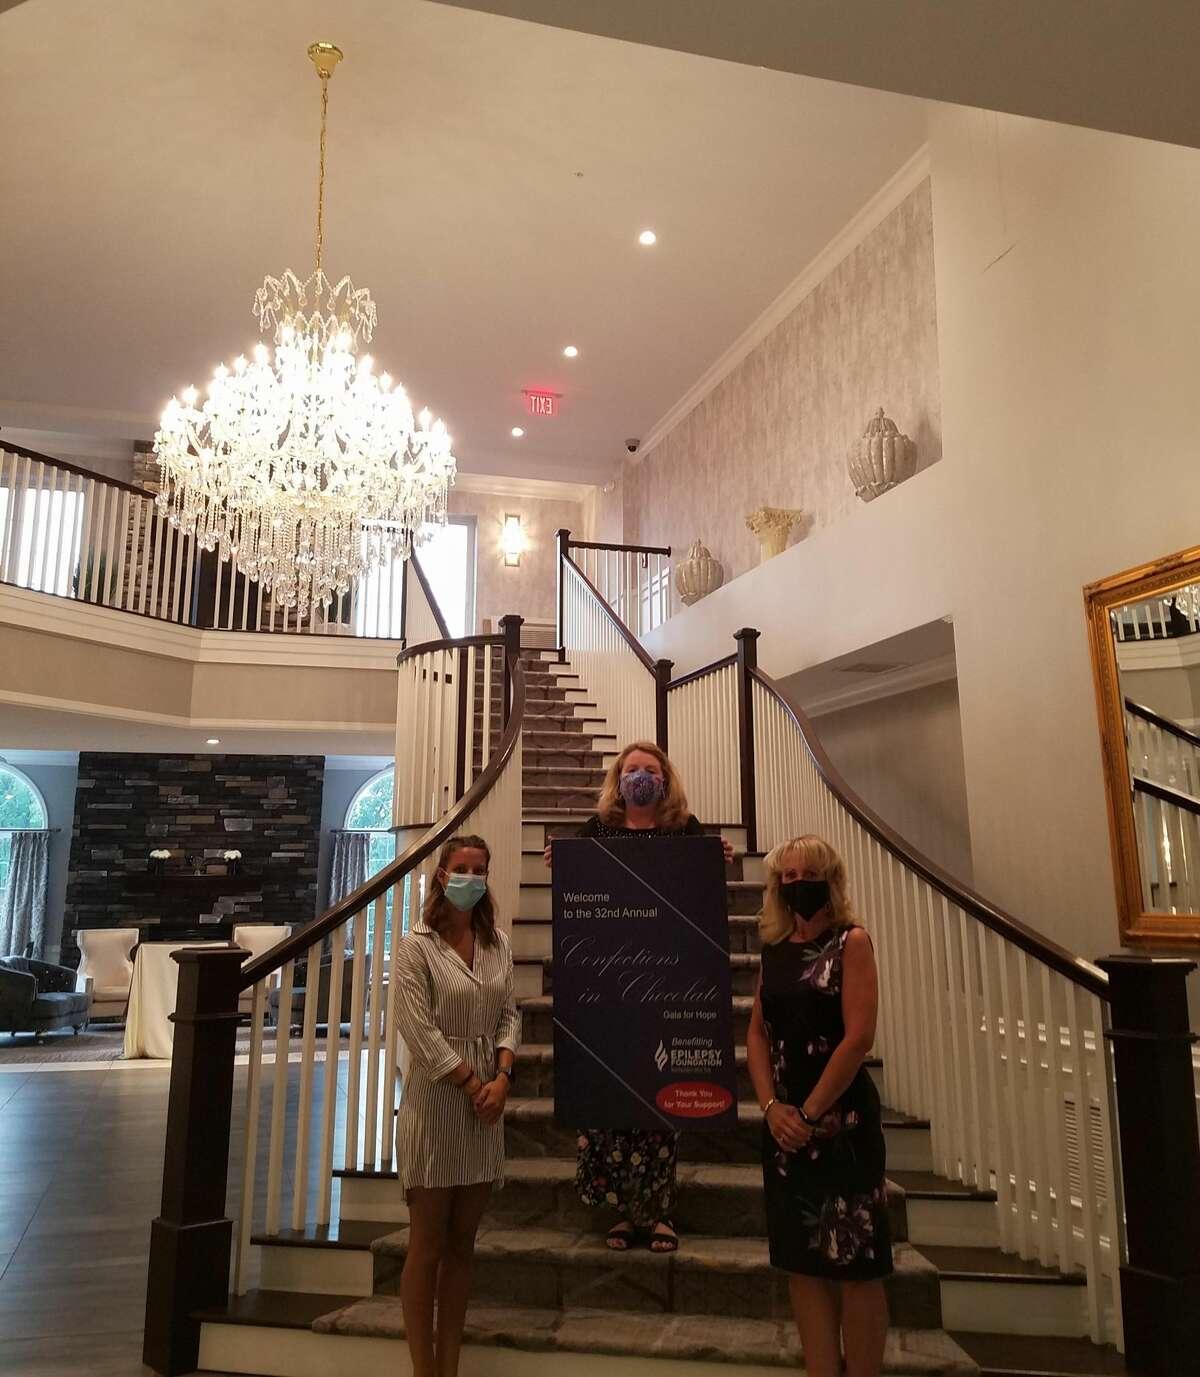 Katelyn Markellos, Susan Kaczynski and Jeannine Garab of the Epilepsy Foundation held a virtual celebration on Zoom, live from the lobby of Glen Sanders Mansion. (Epilepsy Foundation of Northeastern New York)